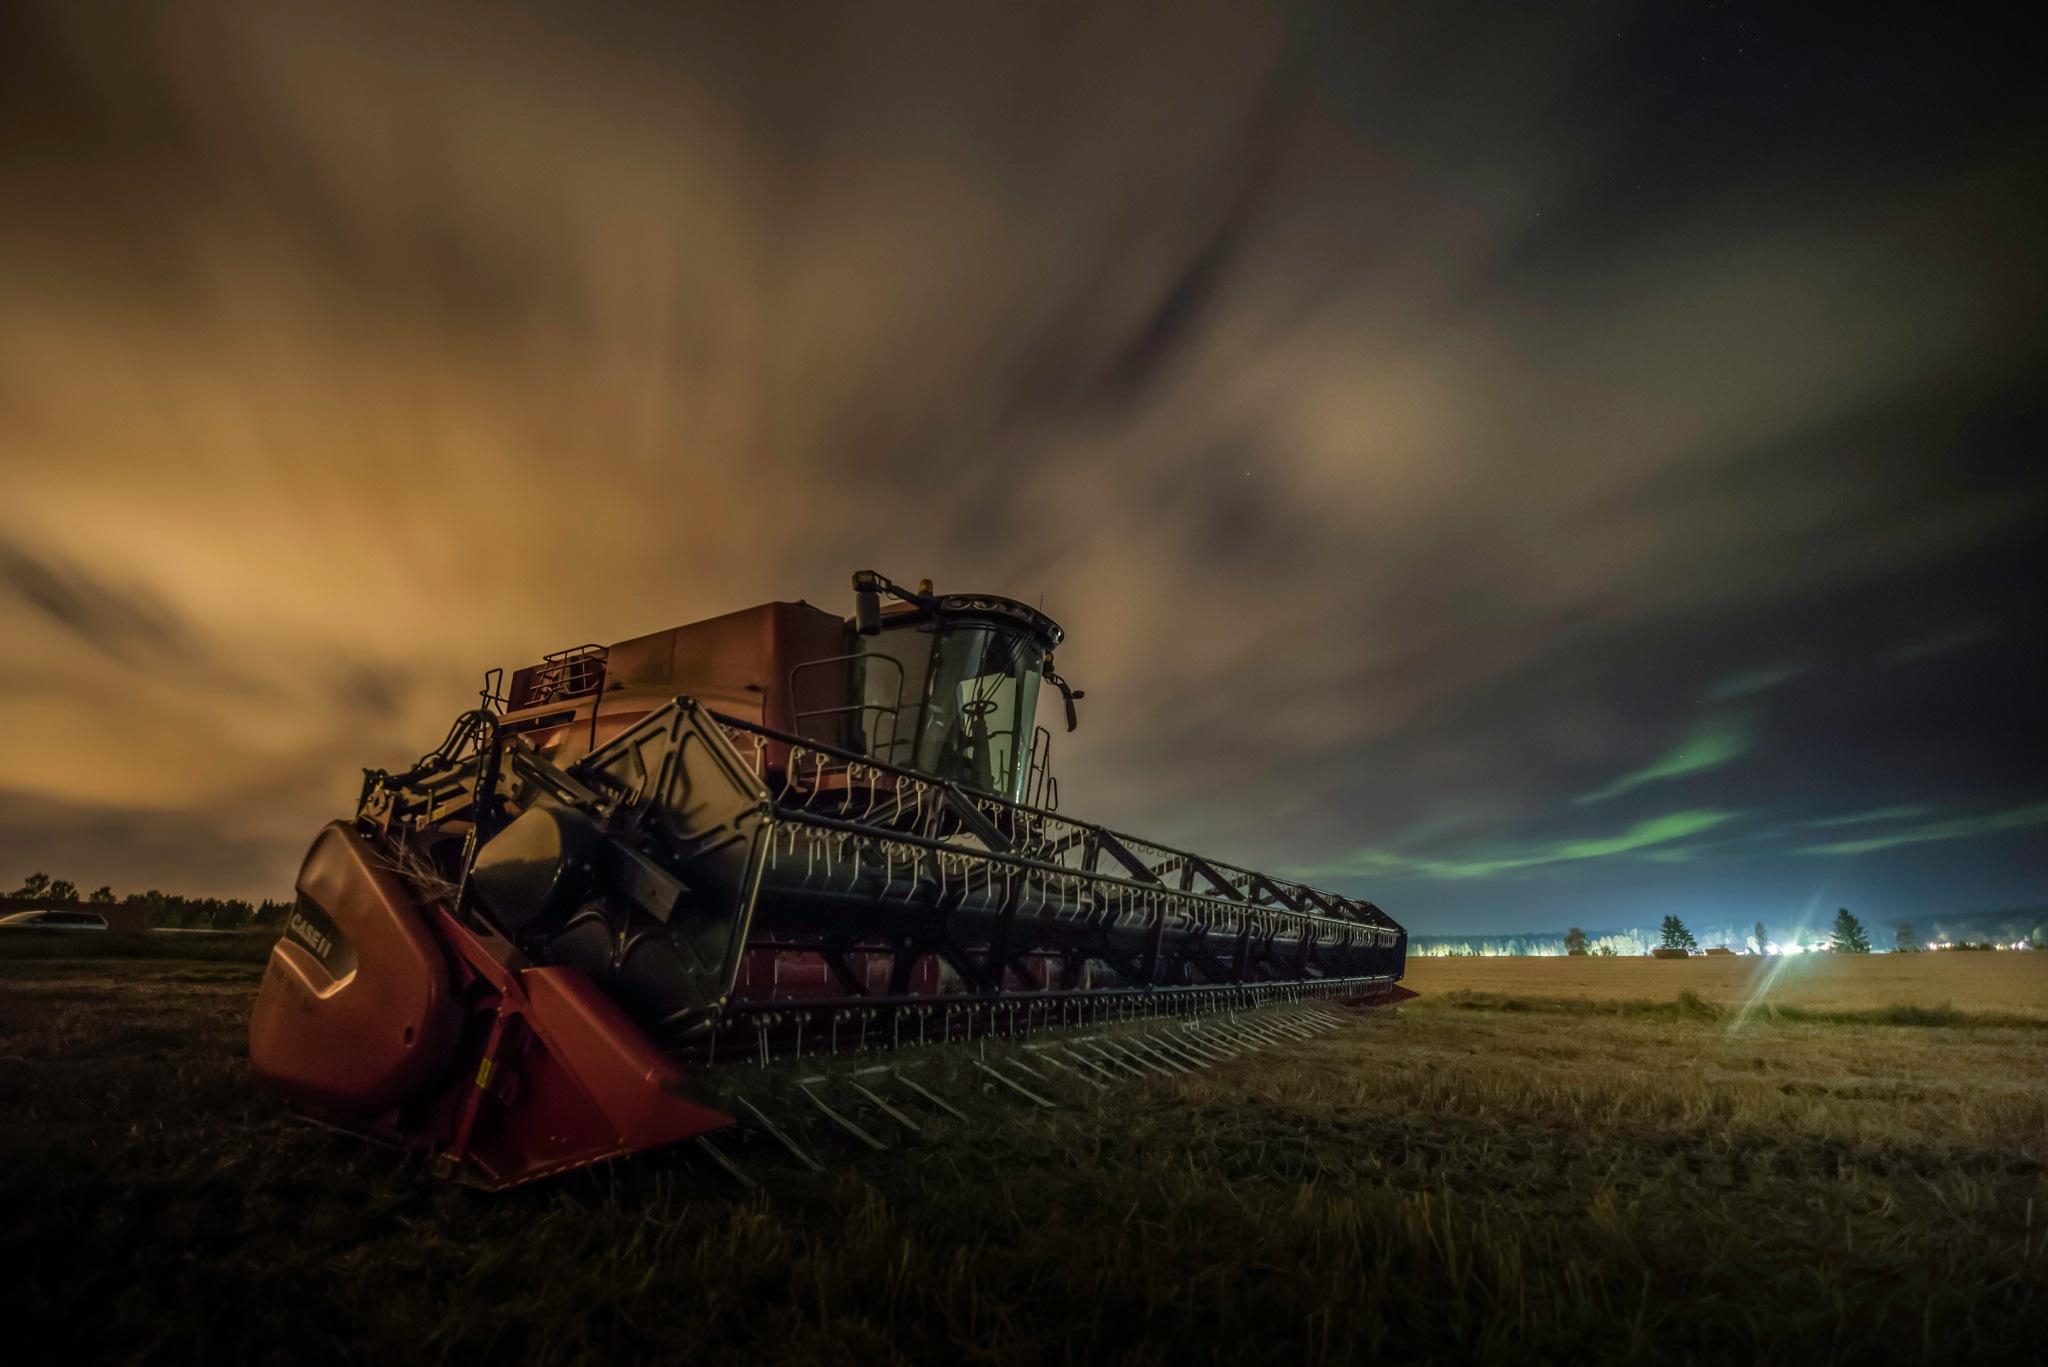 Harvest time by Danne Rydgren